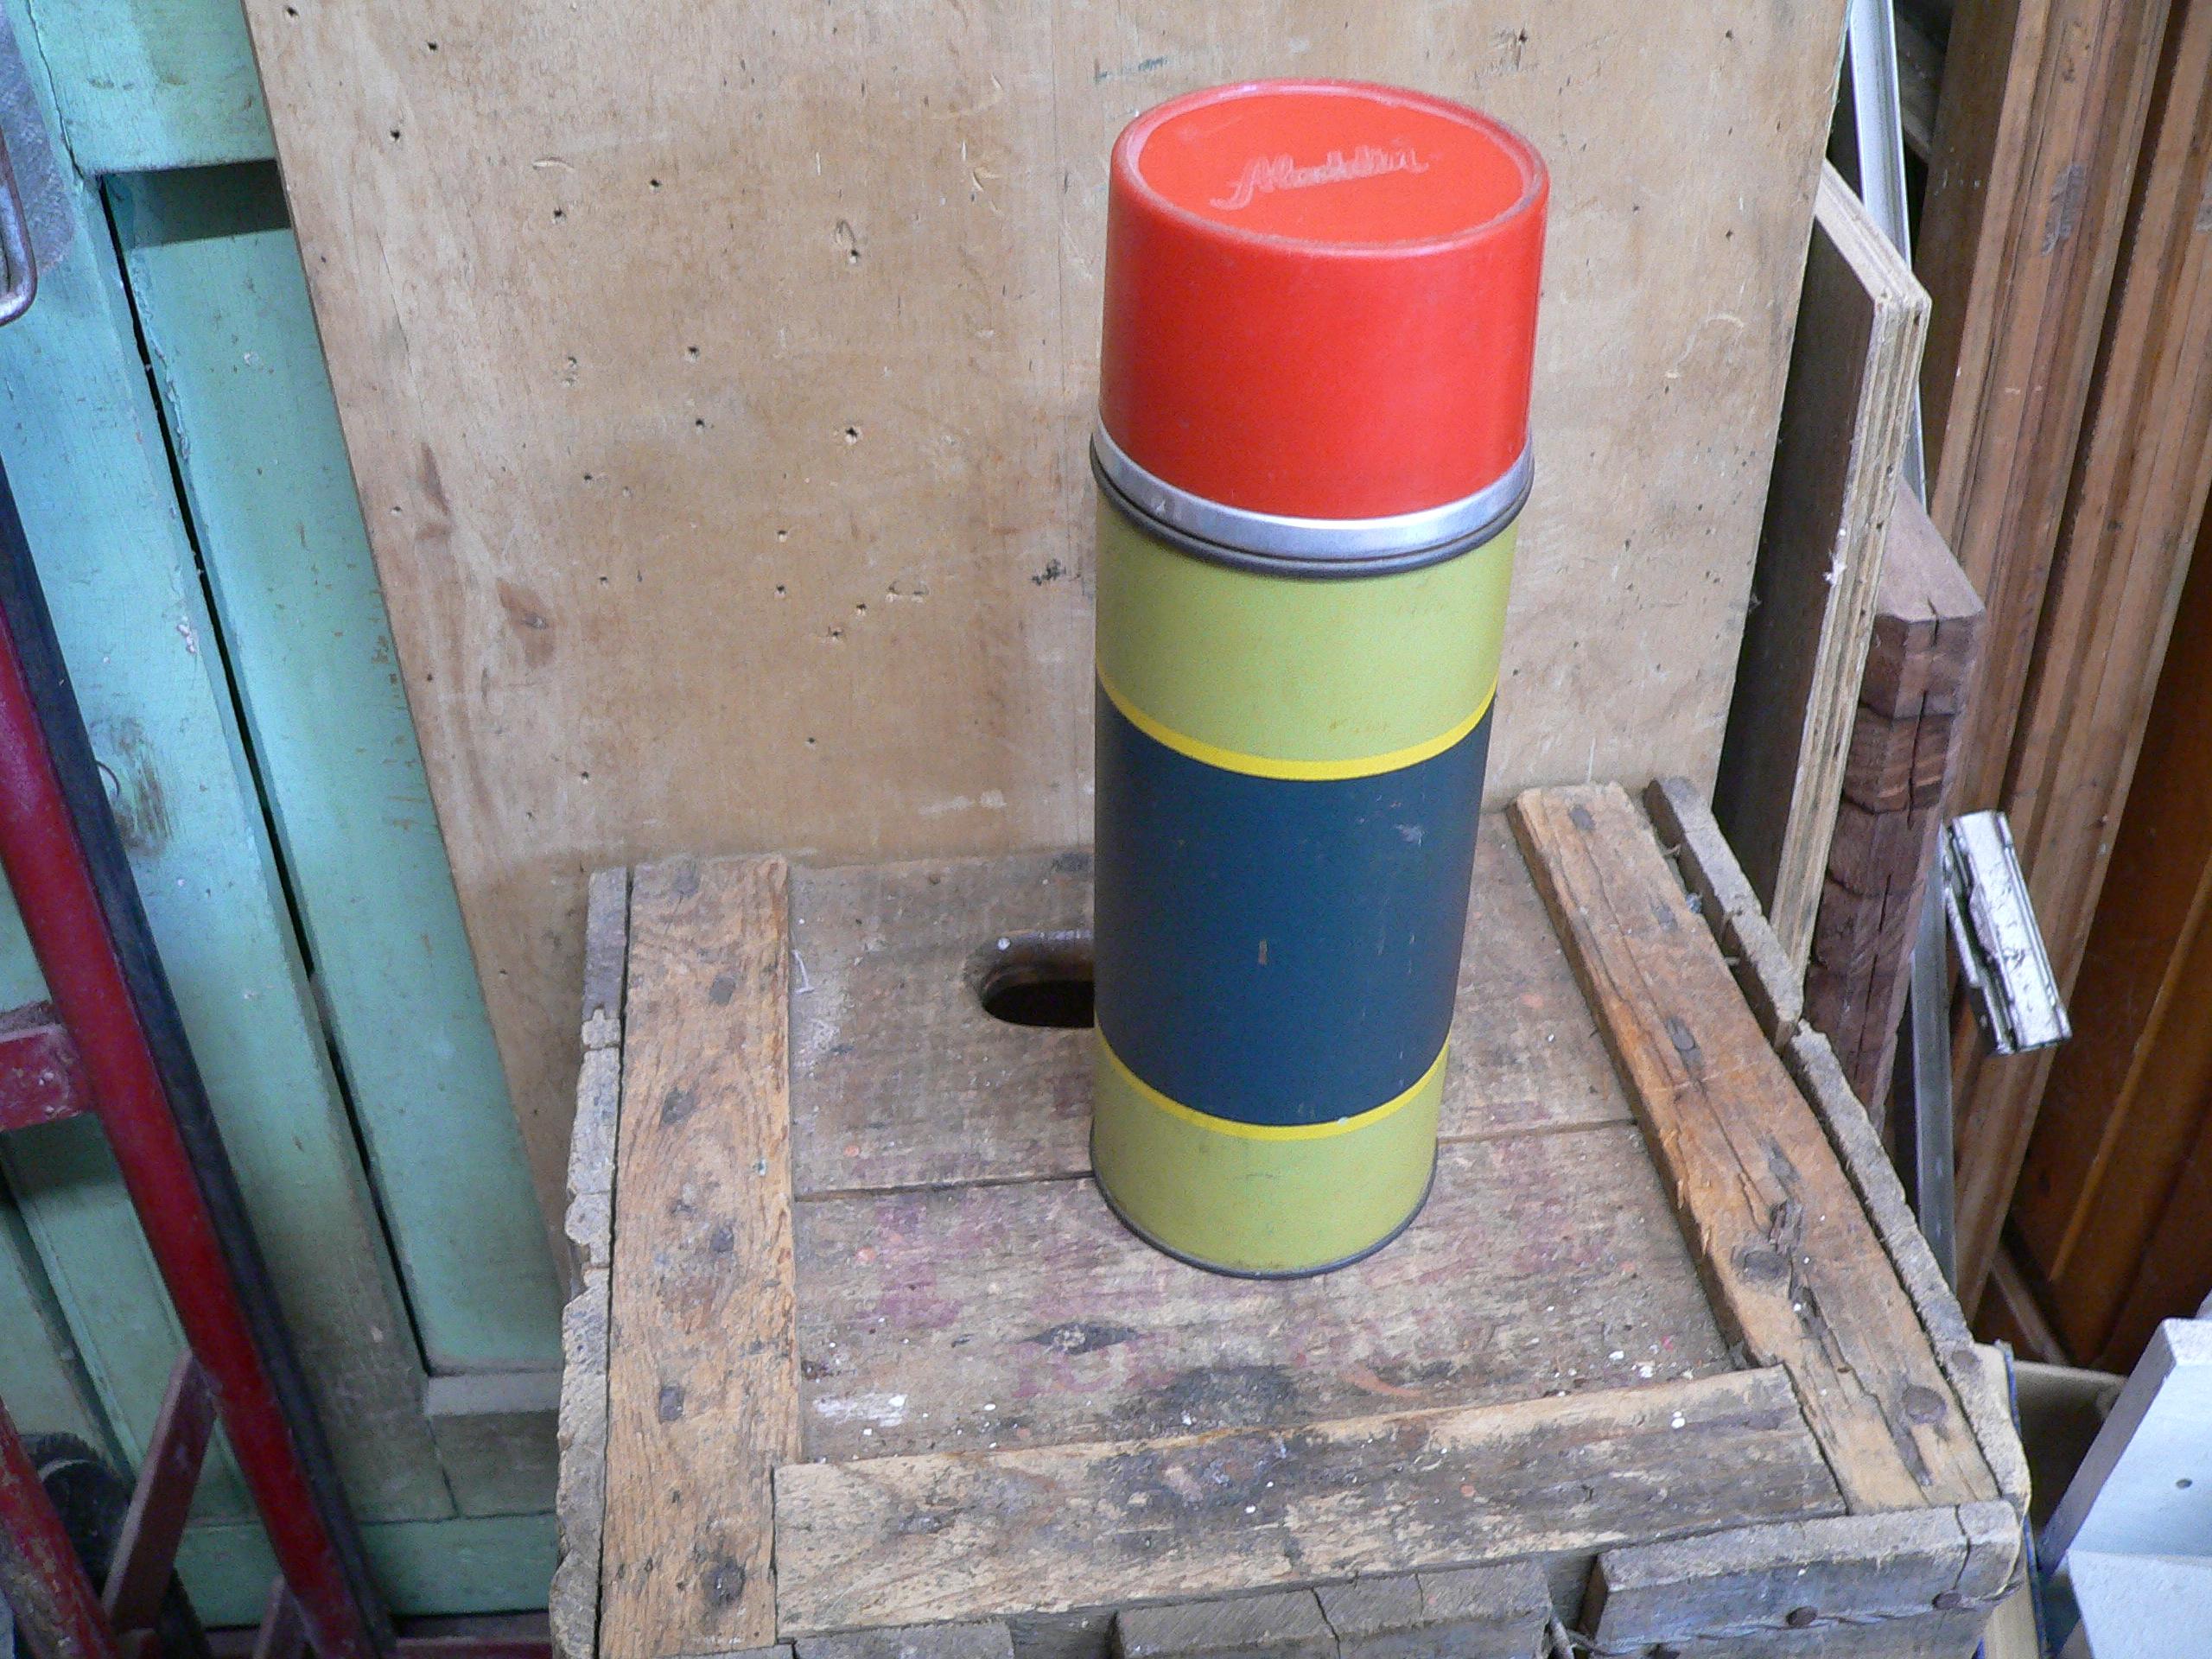 Vieux thermos vintage aladin # 6253.18